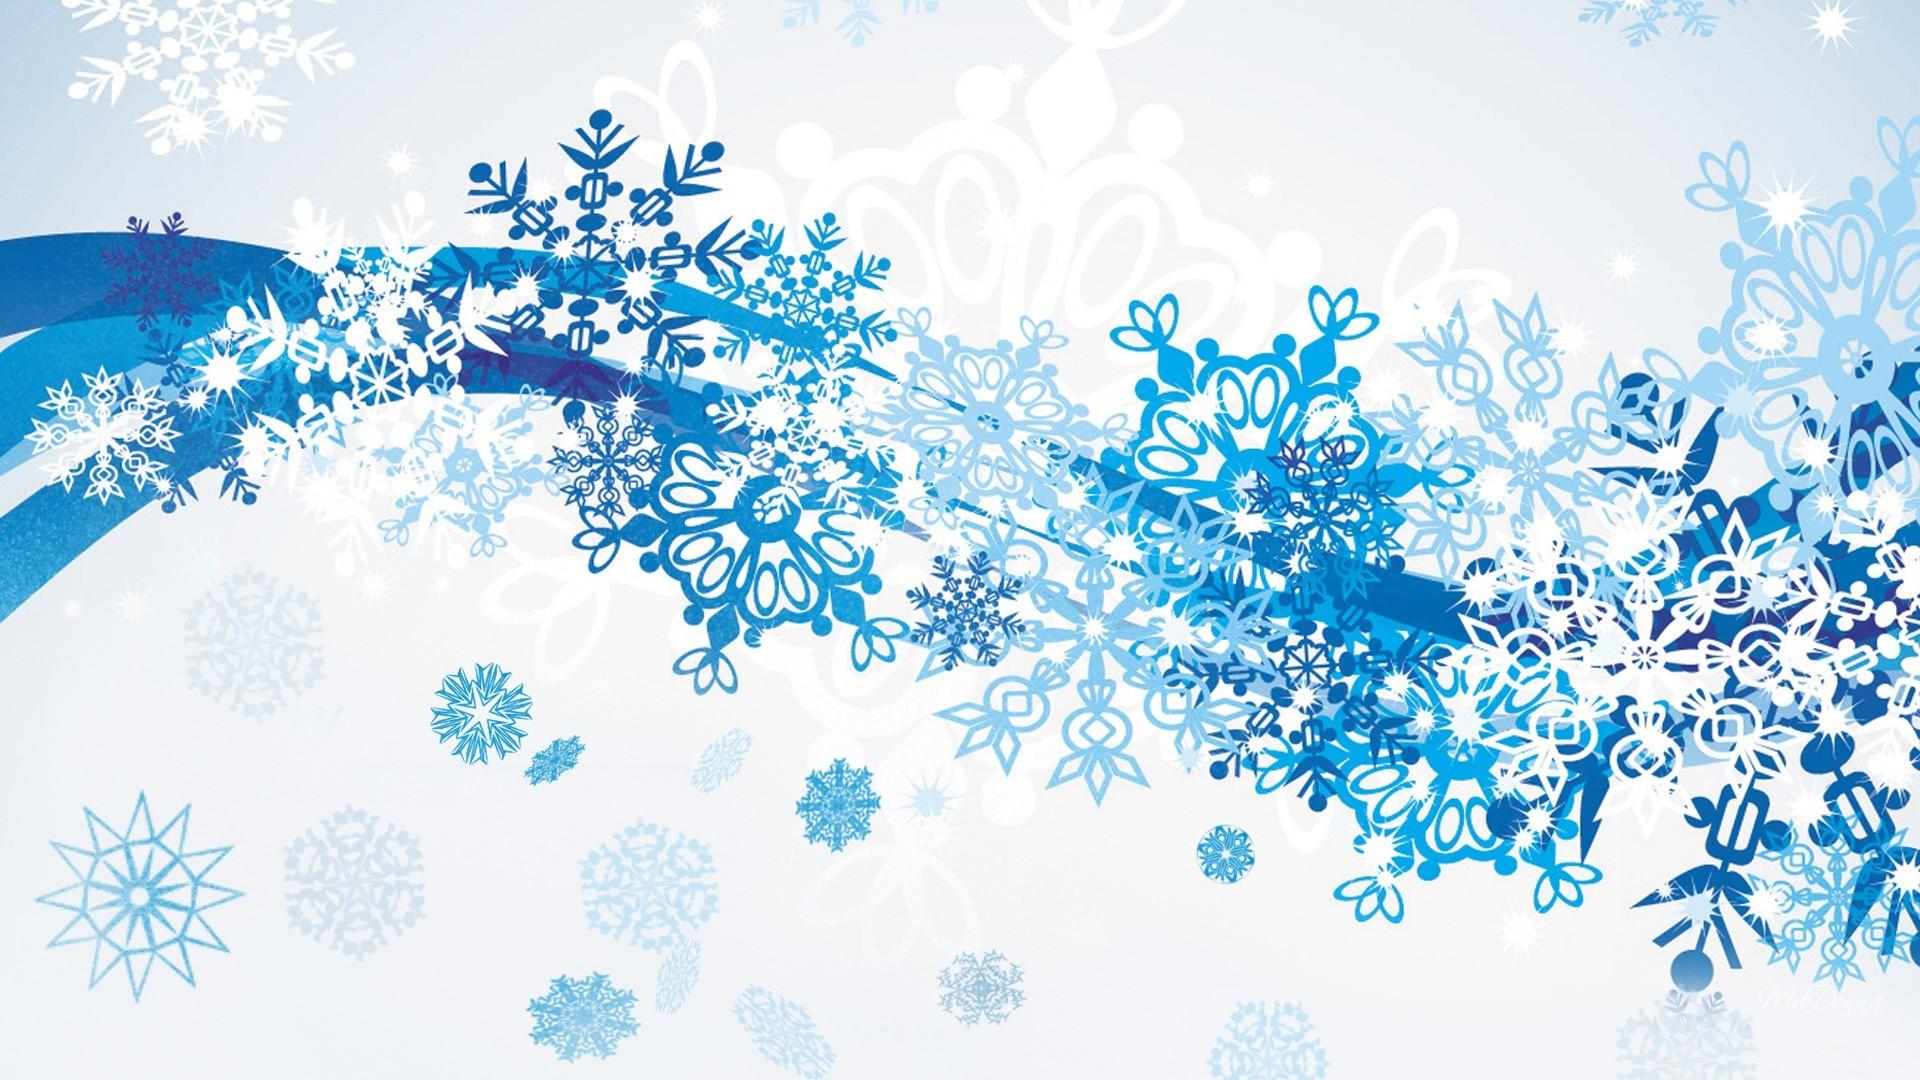 Snow Desktop Wallpapers – Wallpaper, High Definition, High Quality .